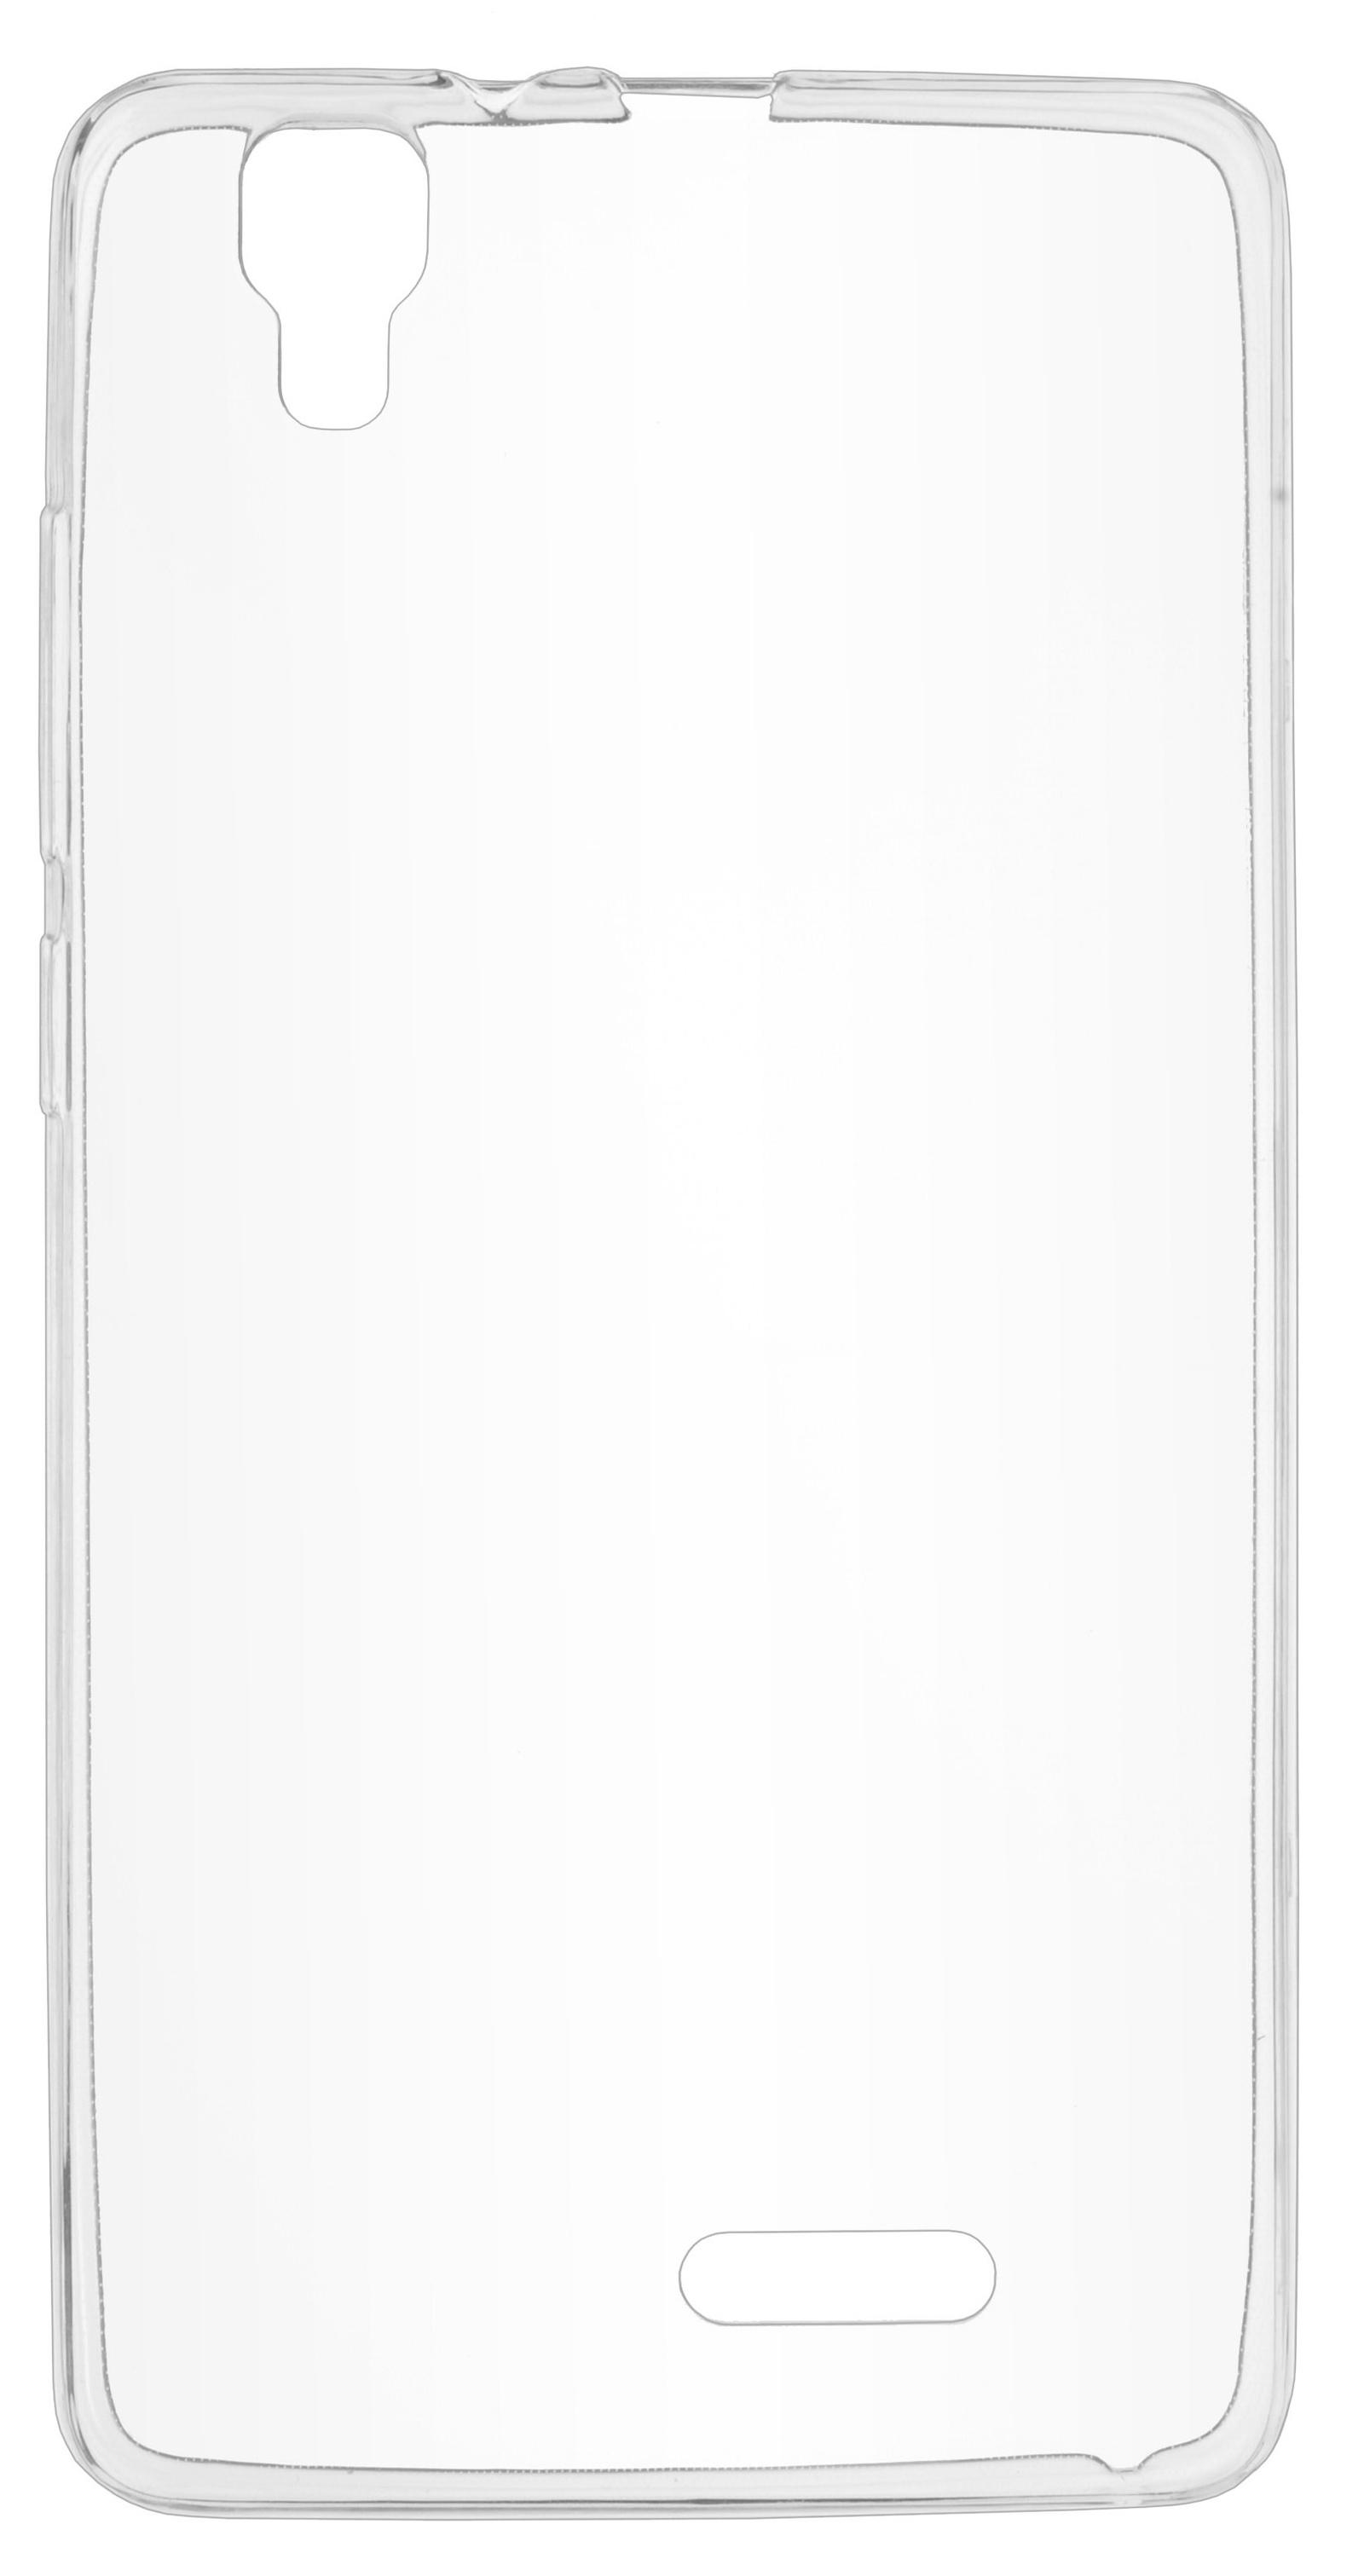 Чехол для сотового телефона skinBOX Slim Silicone, 4660041409475, прозрачный цены онлайн